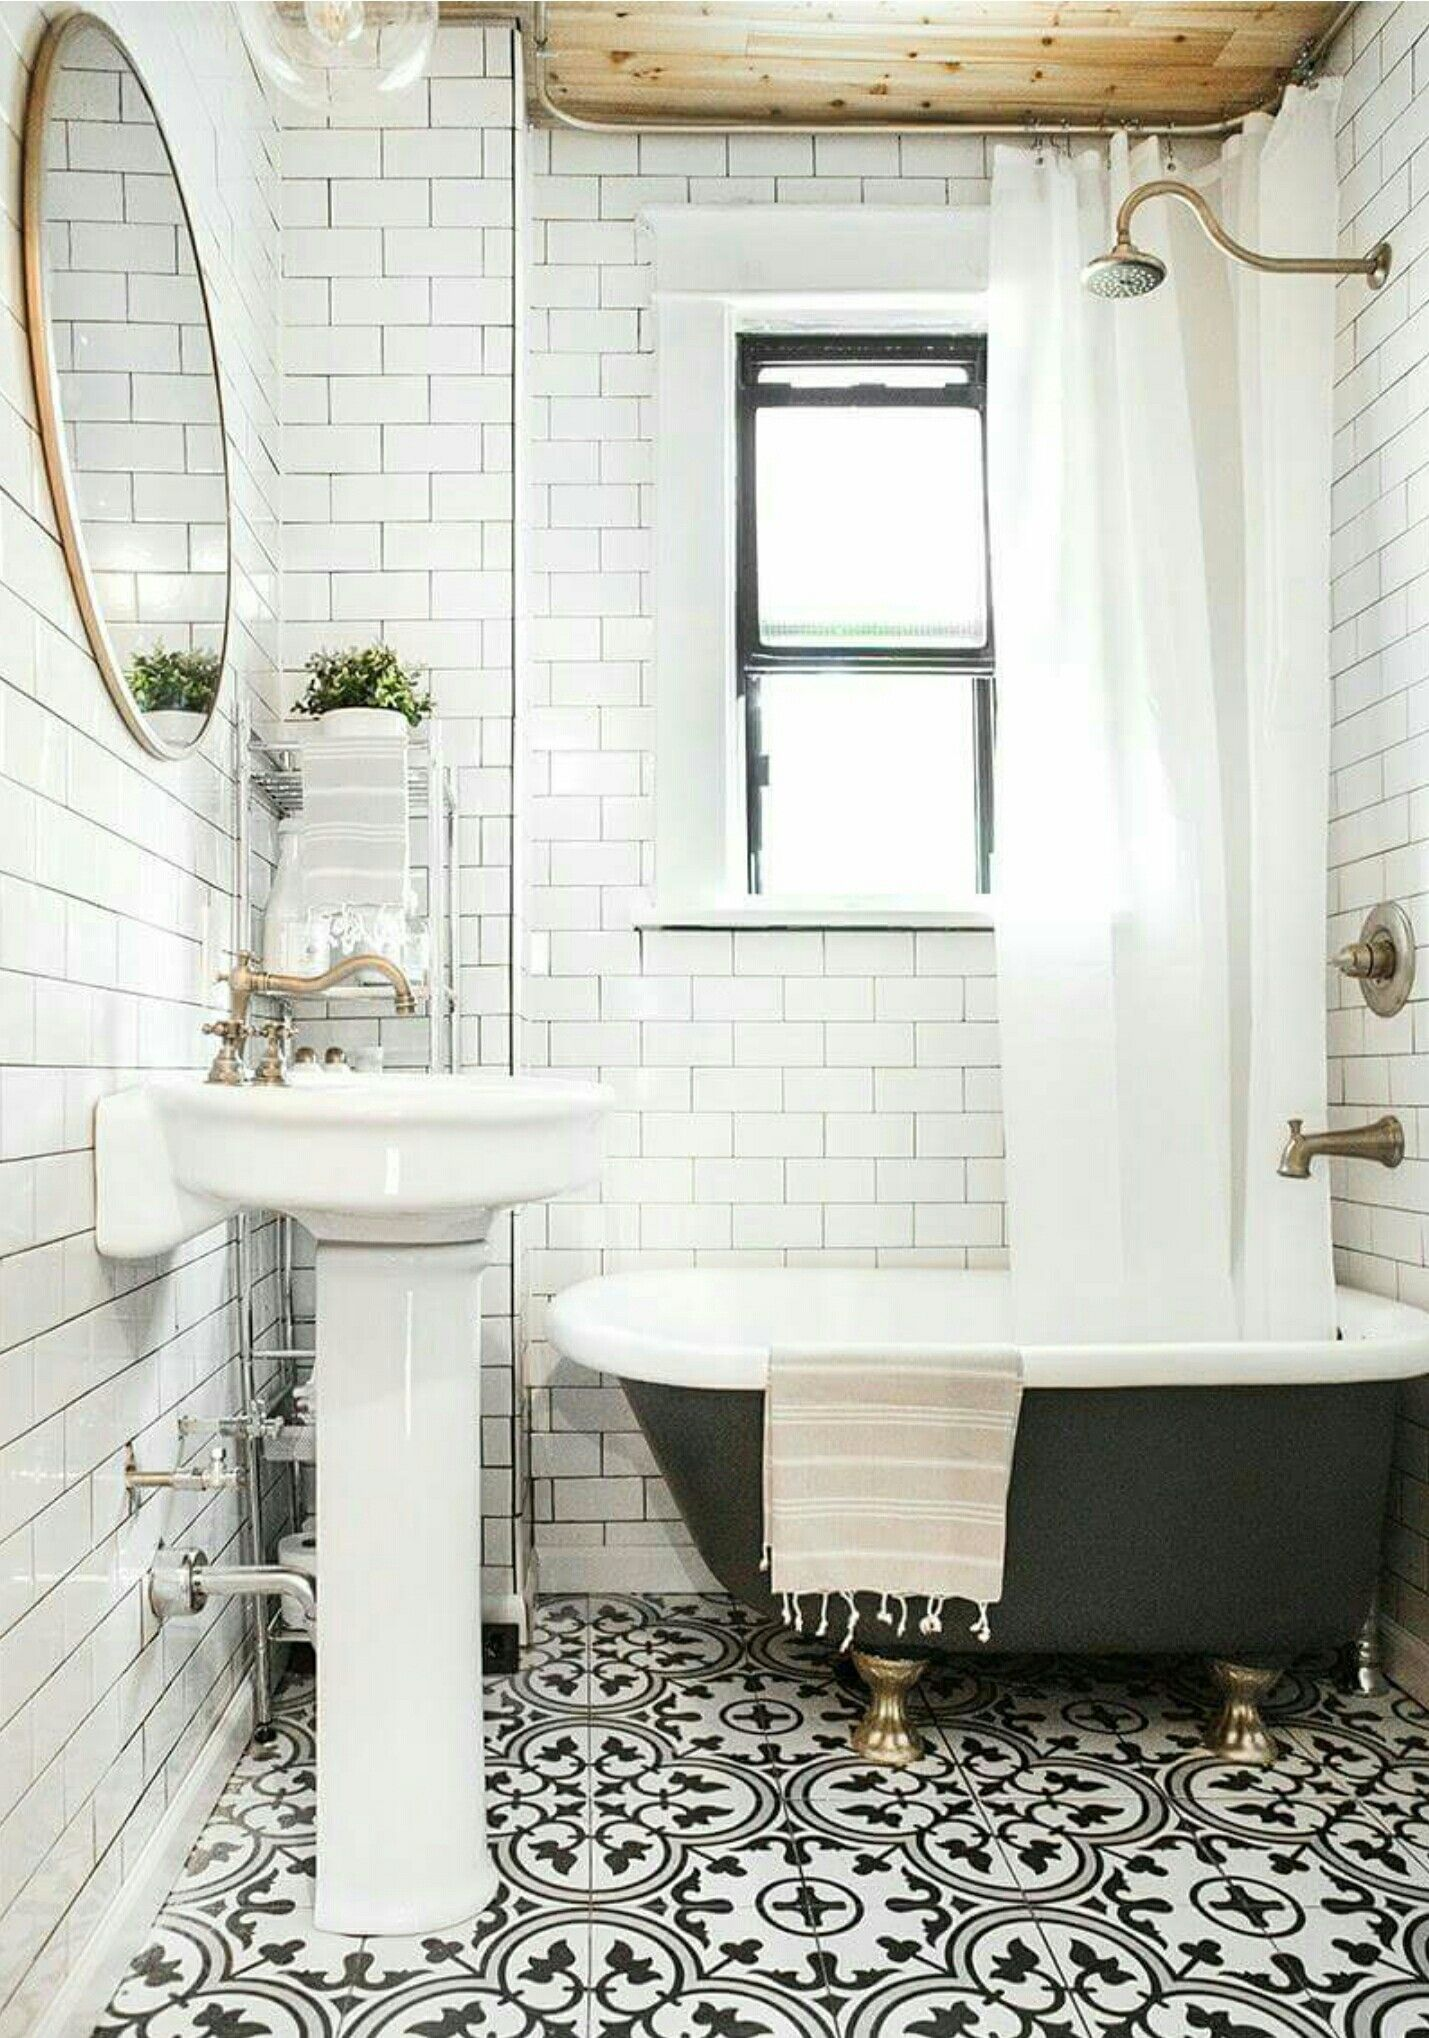 Pin by Rachel Stafford on Interior Inspiration | Pinterest | Bath ...